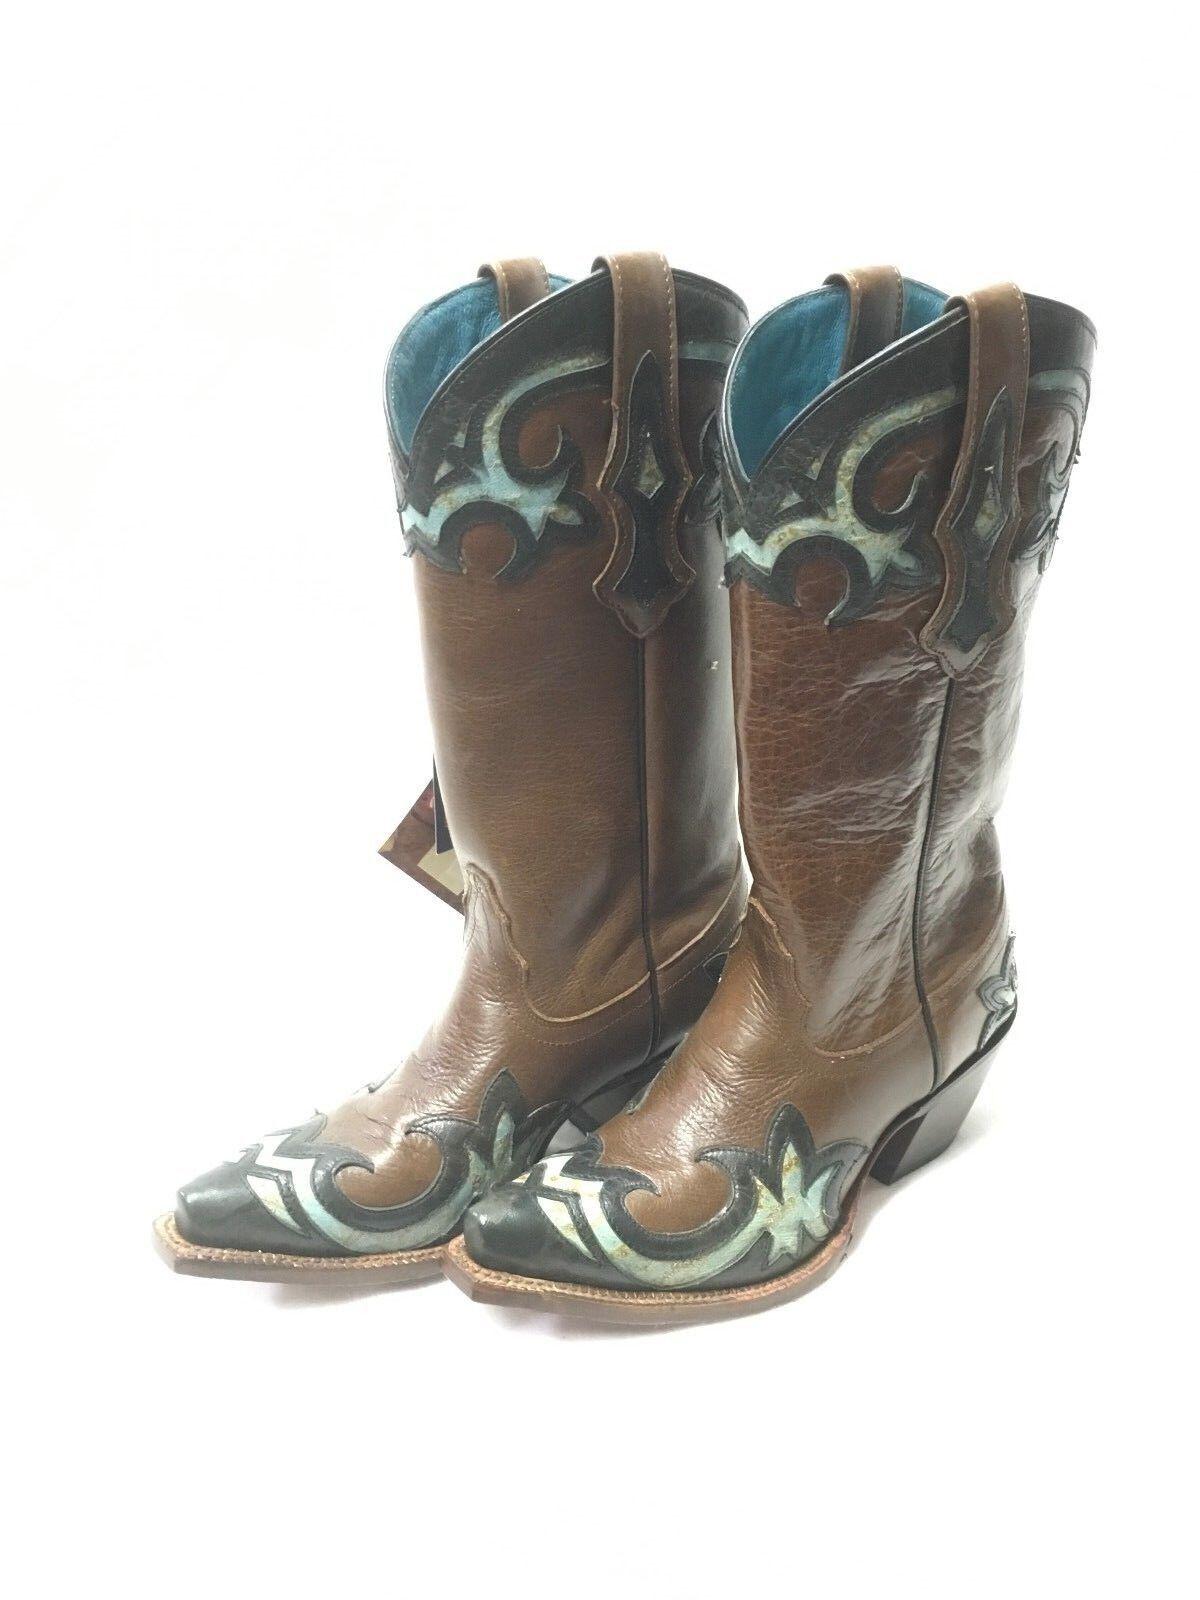 Ladies Tony Lama Vaquero Boots-Black & Turquoise Wing Tip, Style VF6016